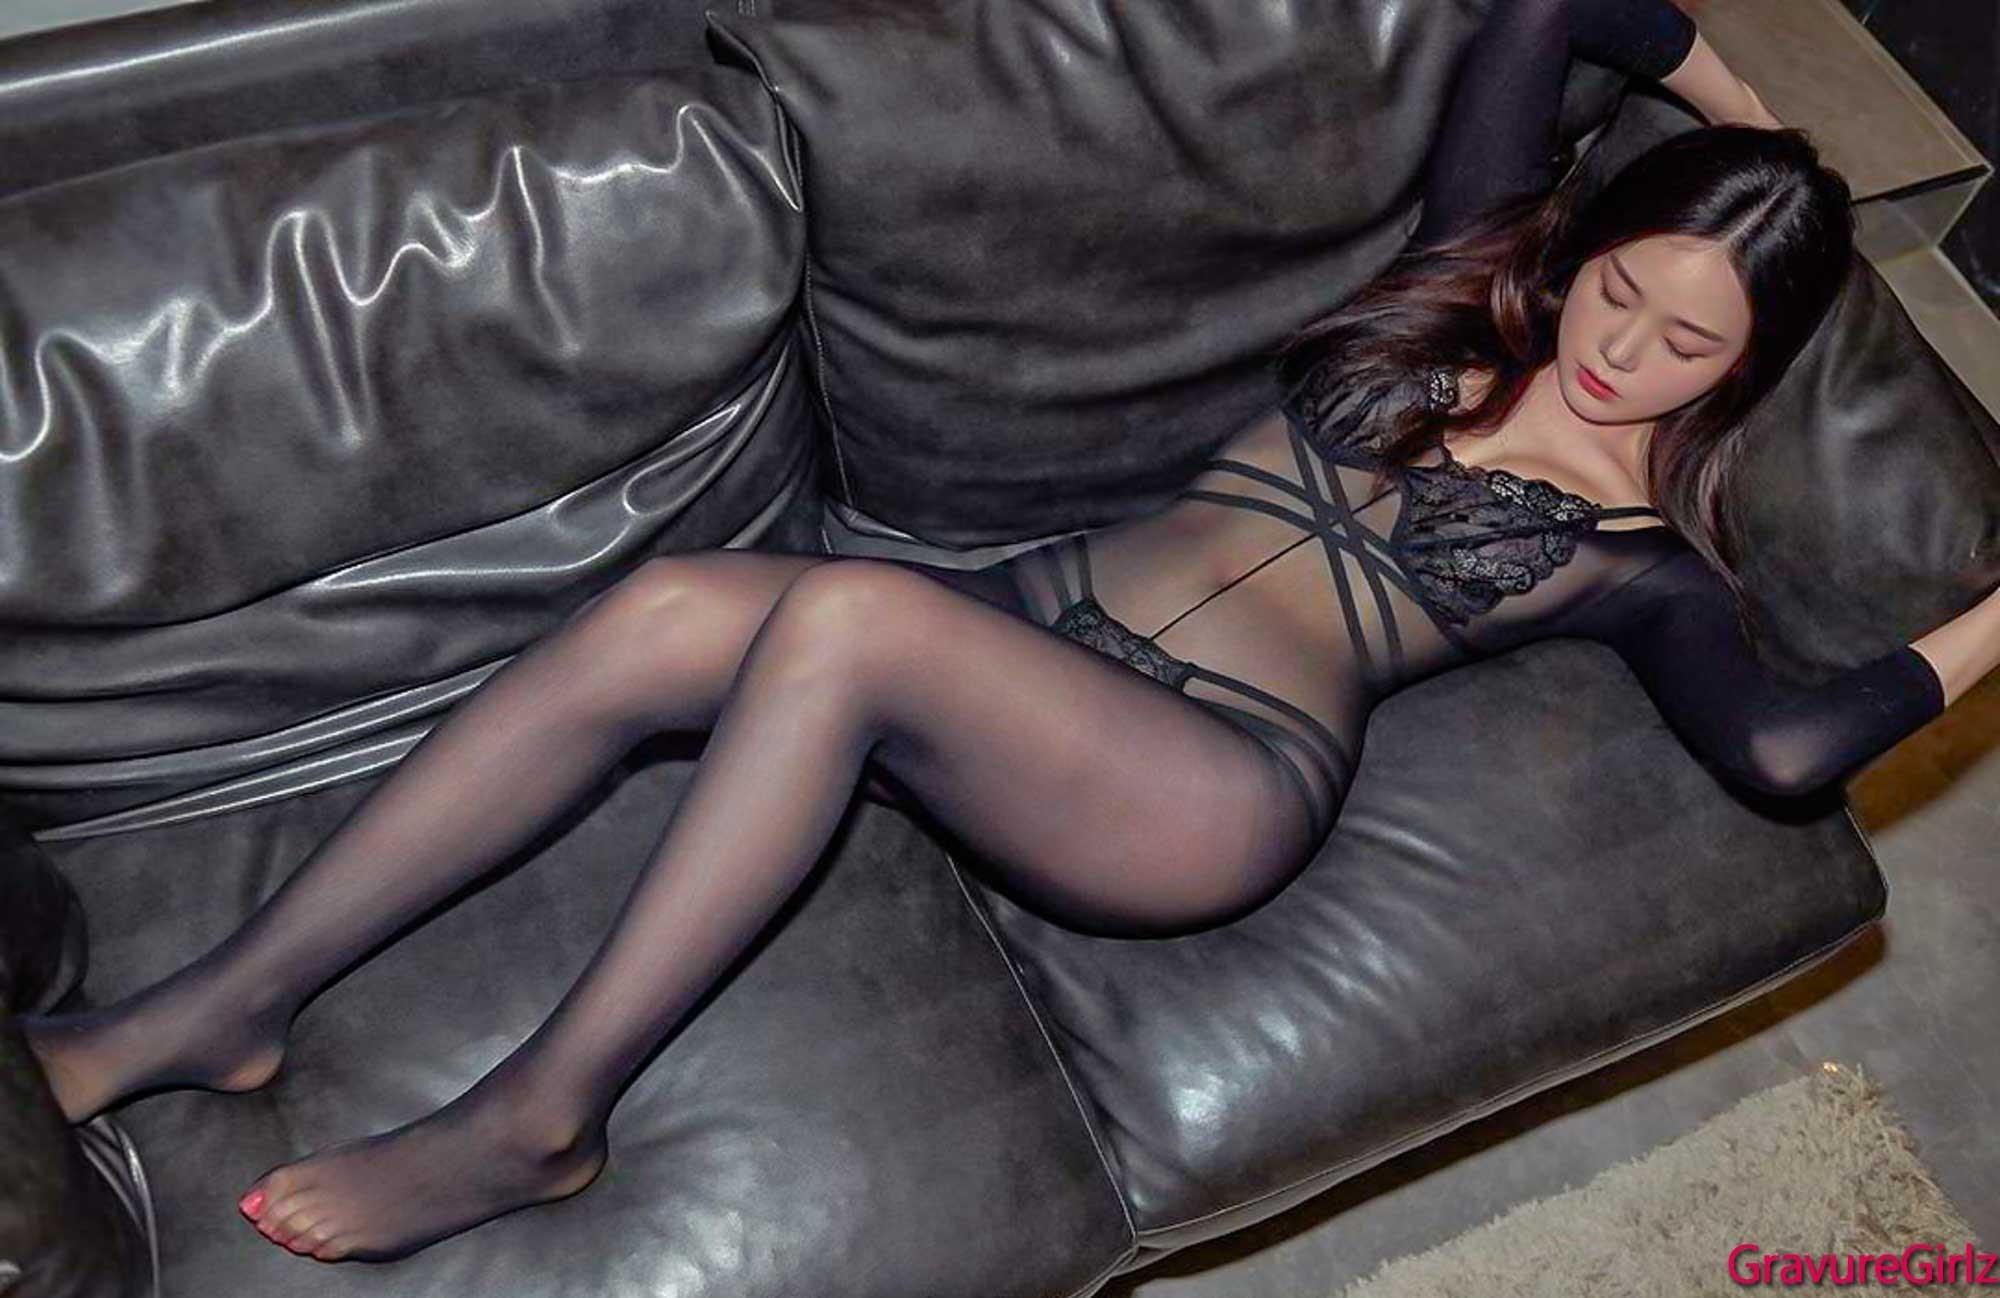 hot Korean girl wearing sexy lingerie